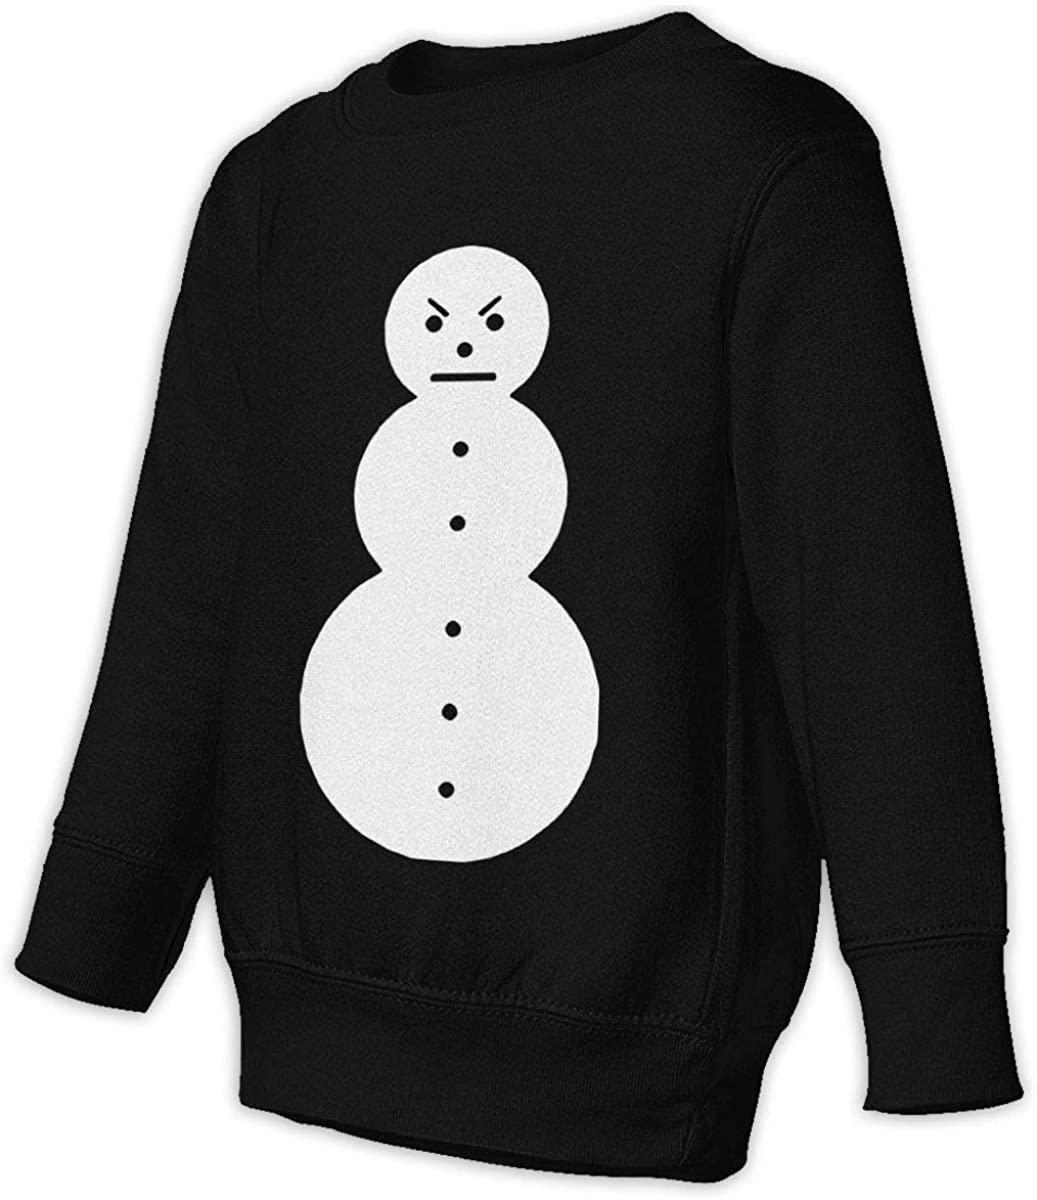 LSHLKJDFN Jeezy Snowman Unisex Sweatshirt Youth Boy and Girls Pullover Sweatshirt Black